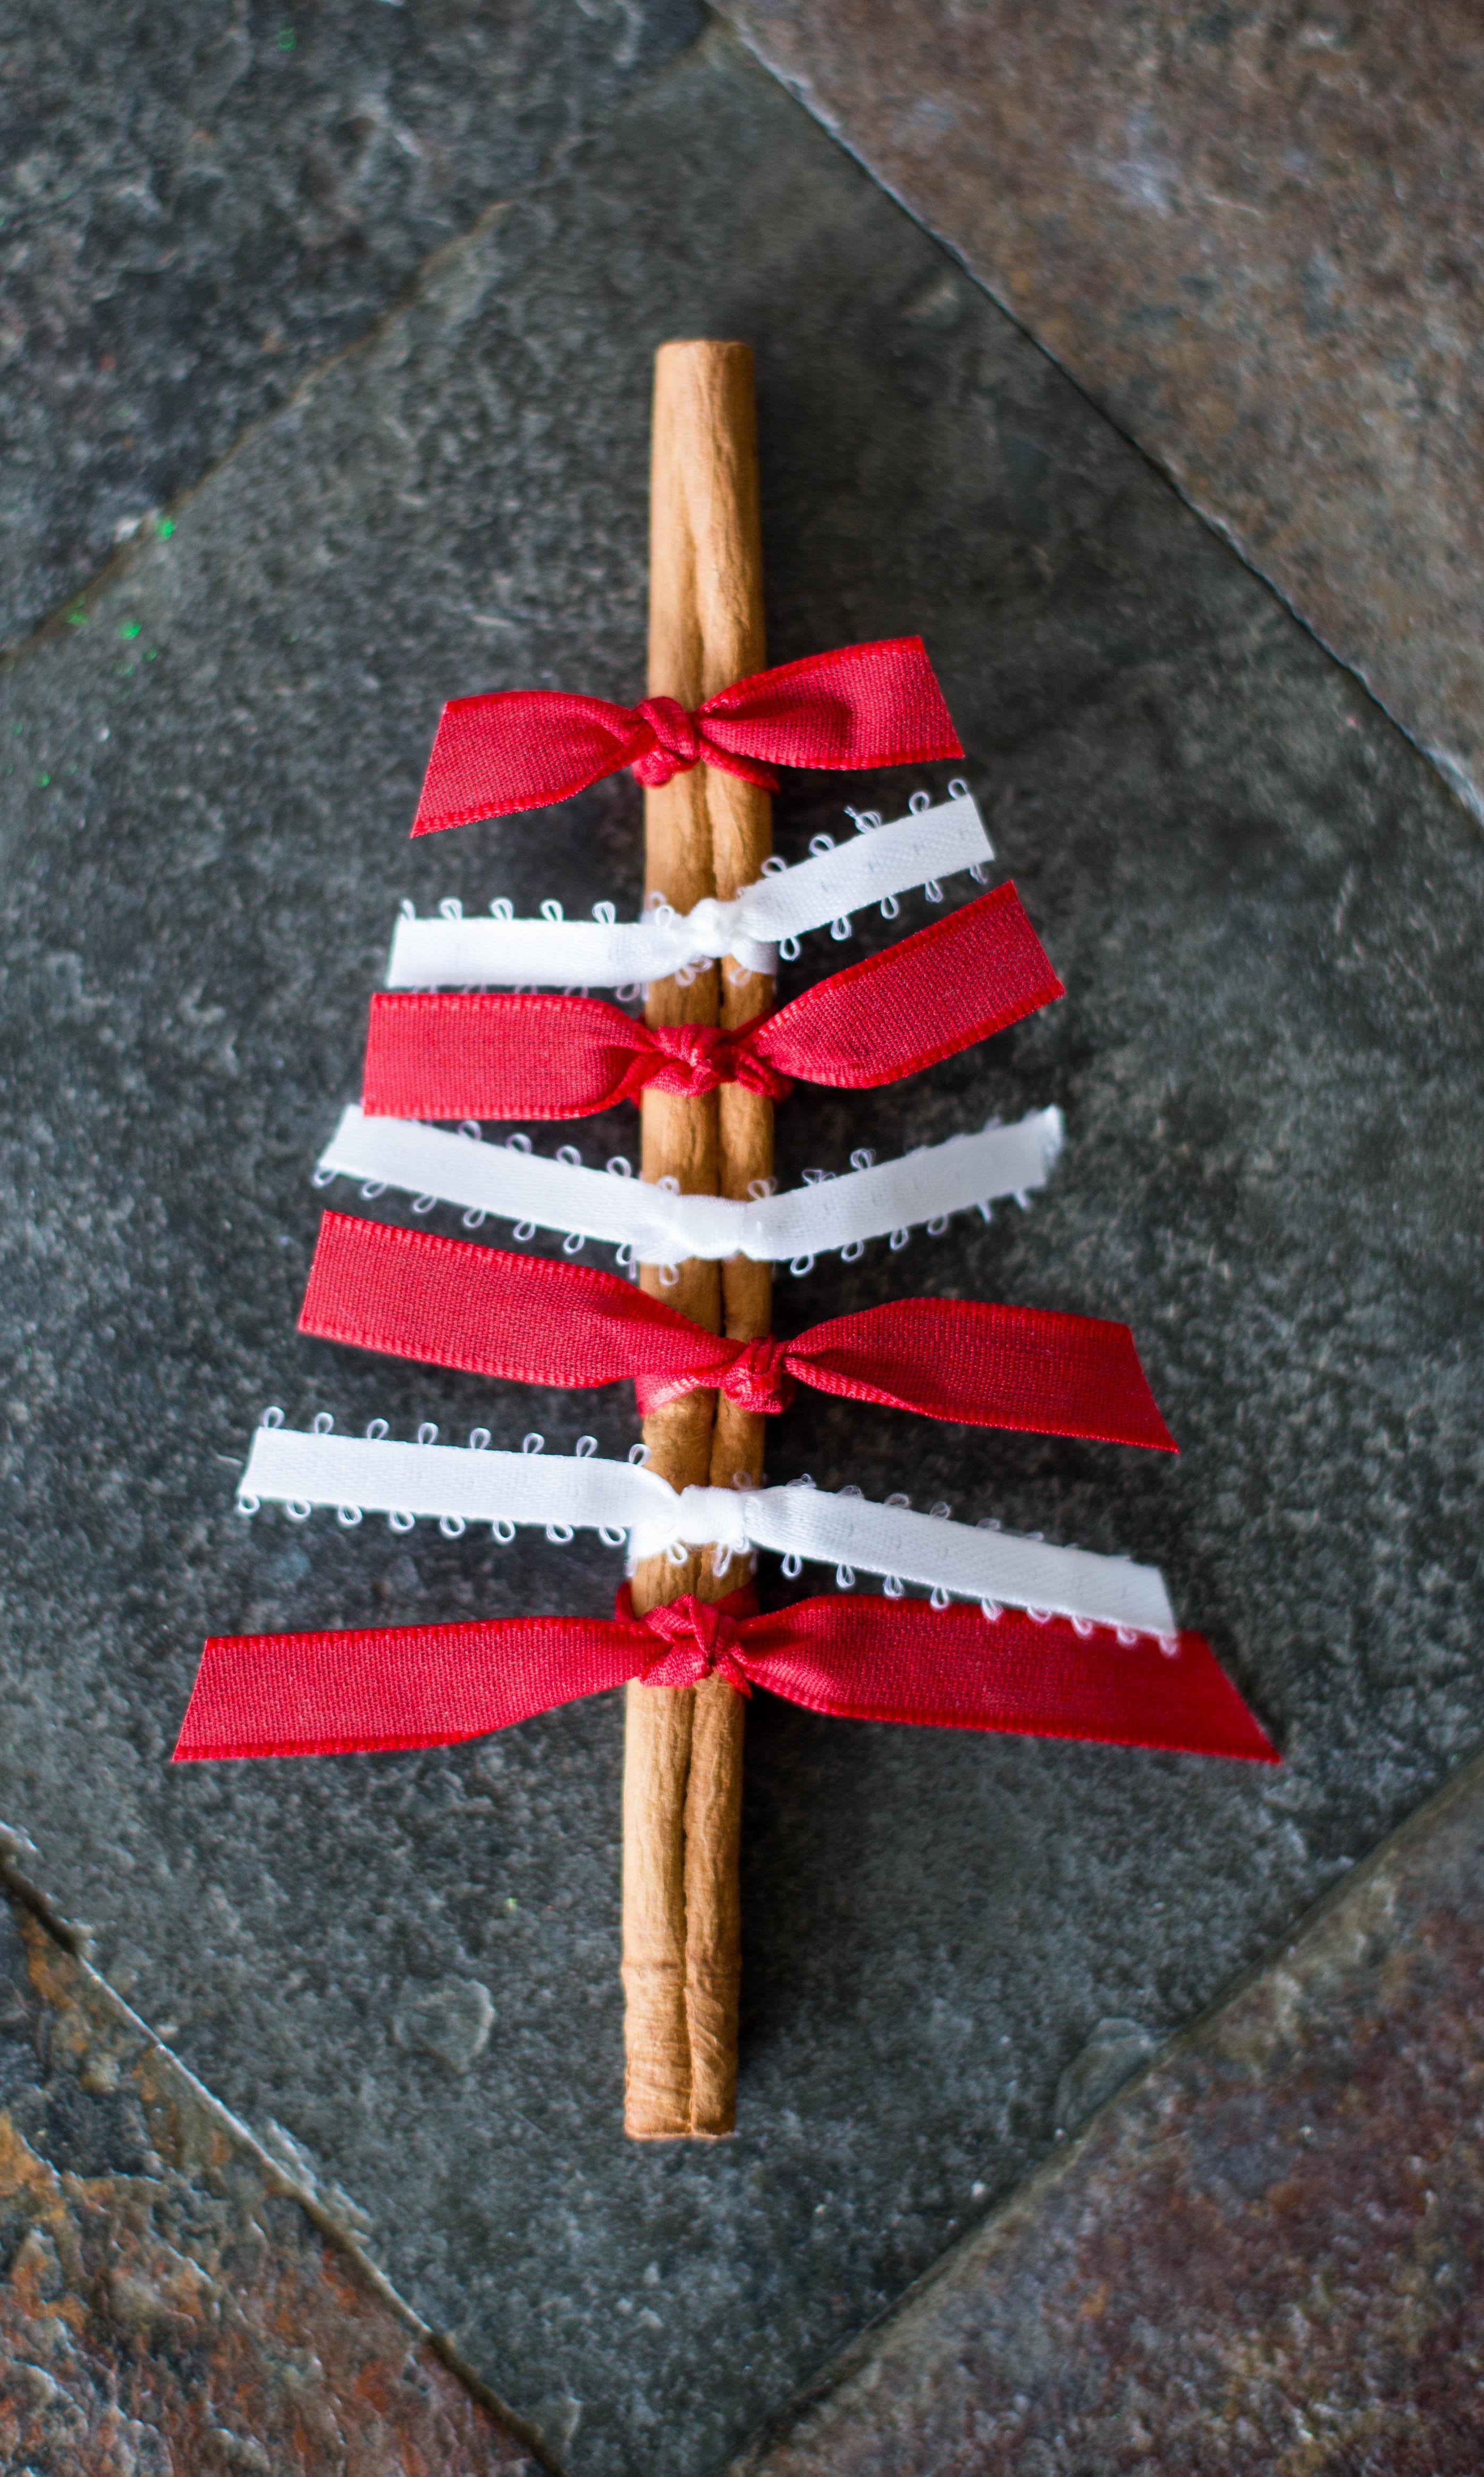 Cinnamon Stick Christmas Ornament - artzycreations.com